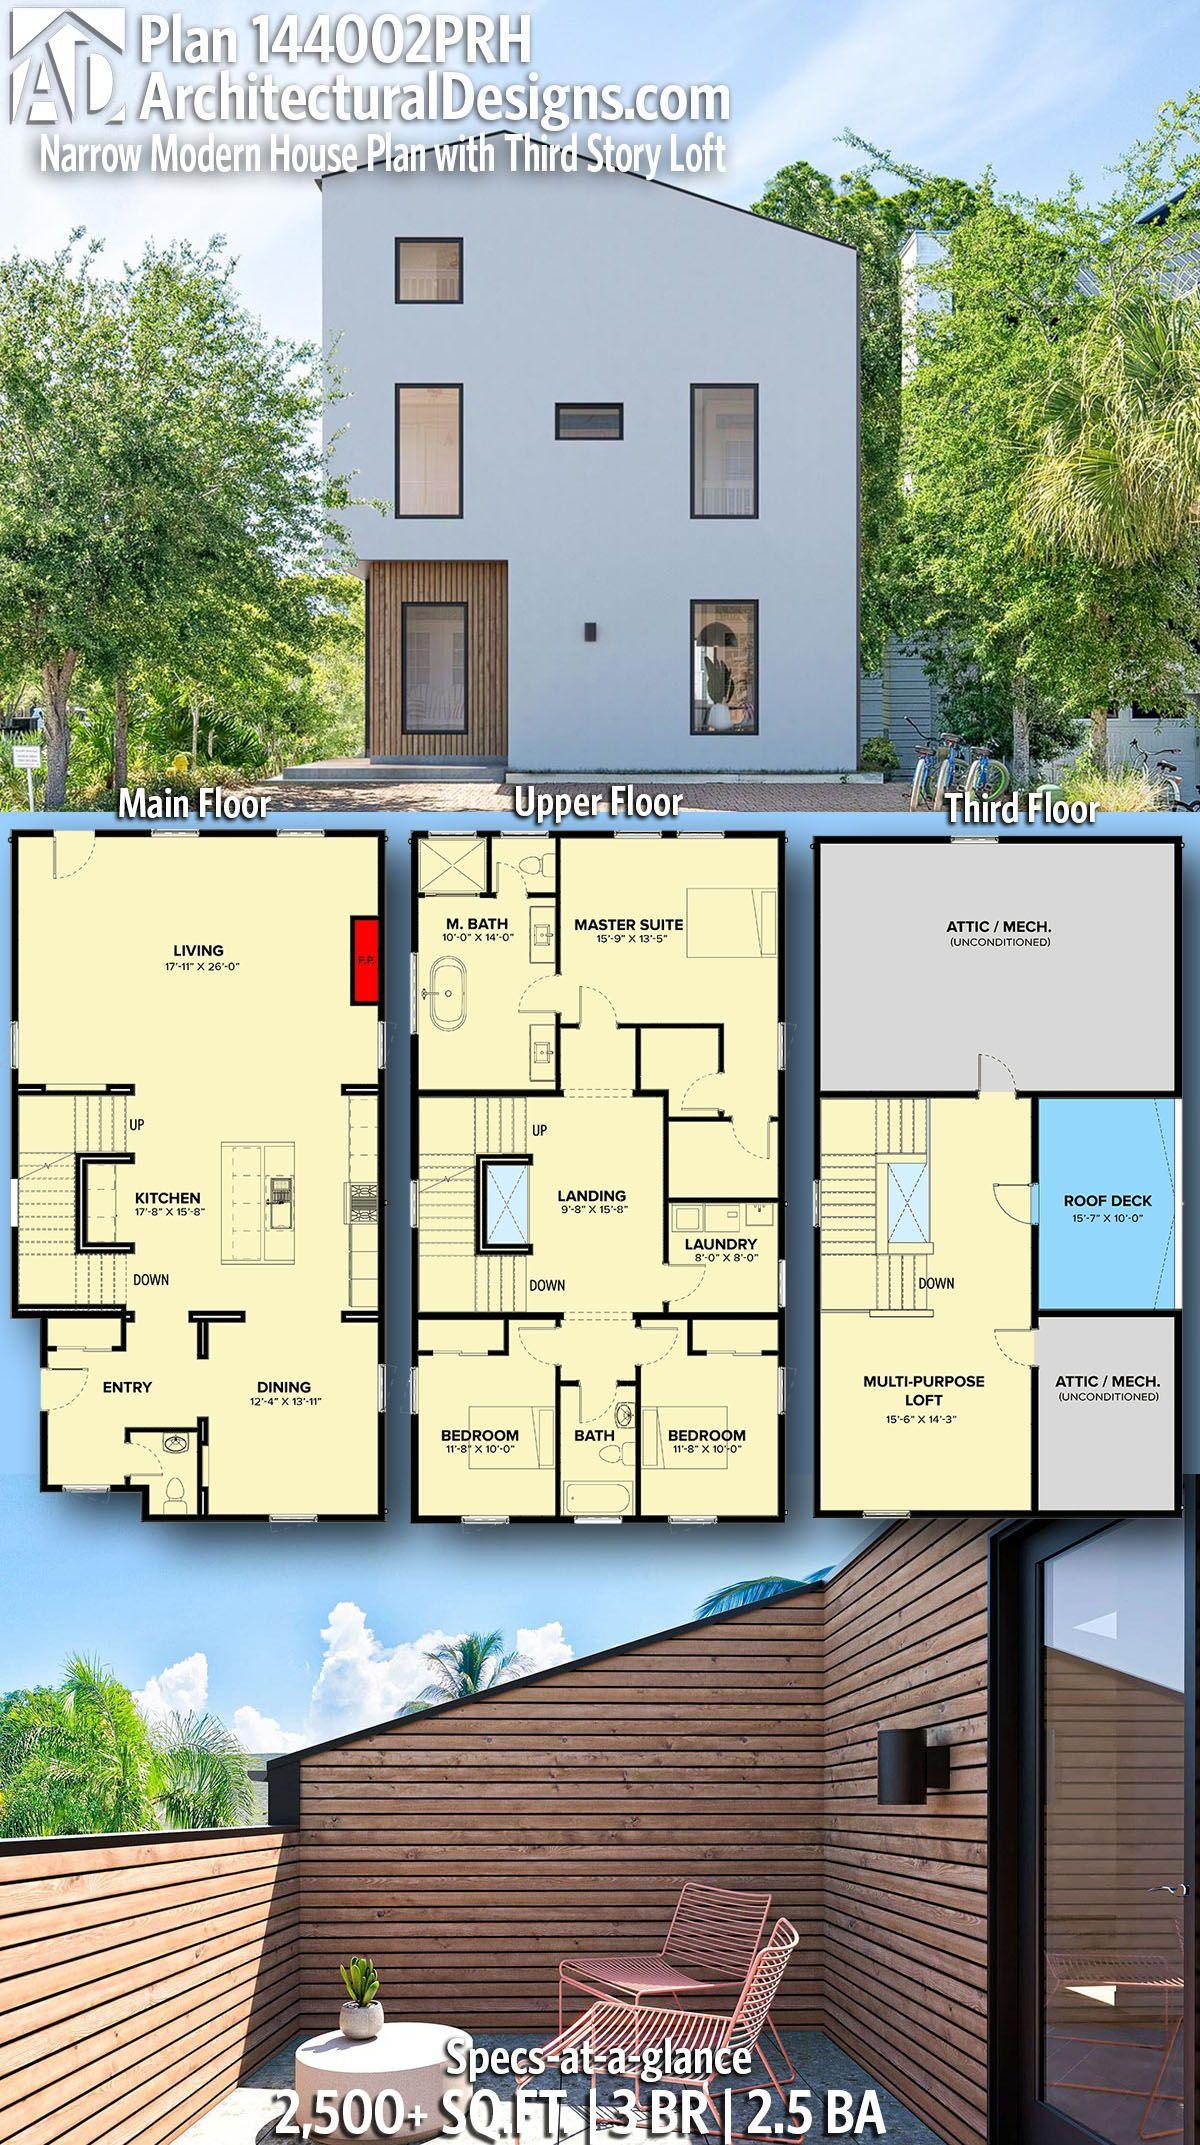 Plan 144002prh Narrow Modern House Plan With Third Story Loft Modern House Plan Narrow Lot House Plans Modern House Plans